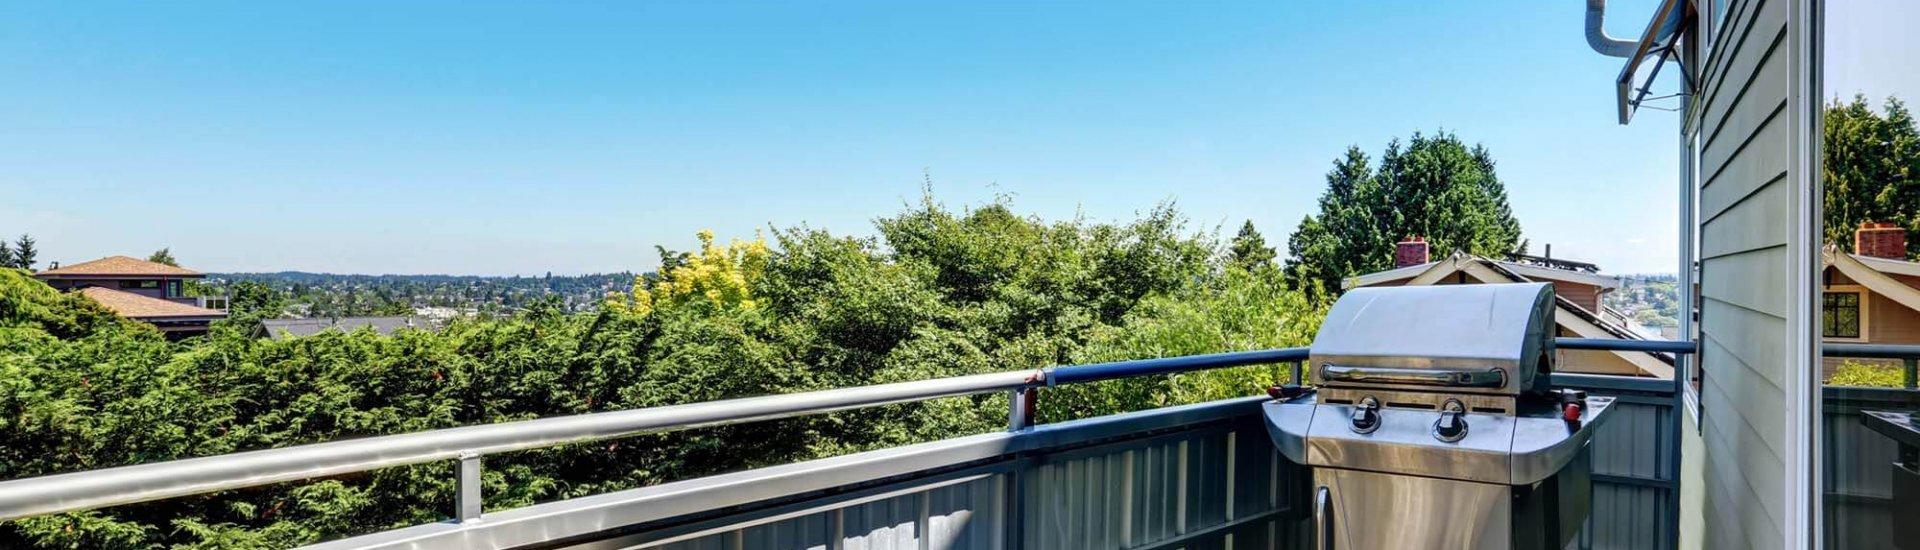 Gasgrill auf dem Balkon - 8 Tipps